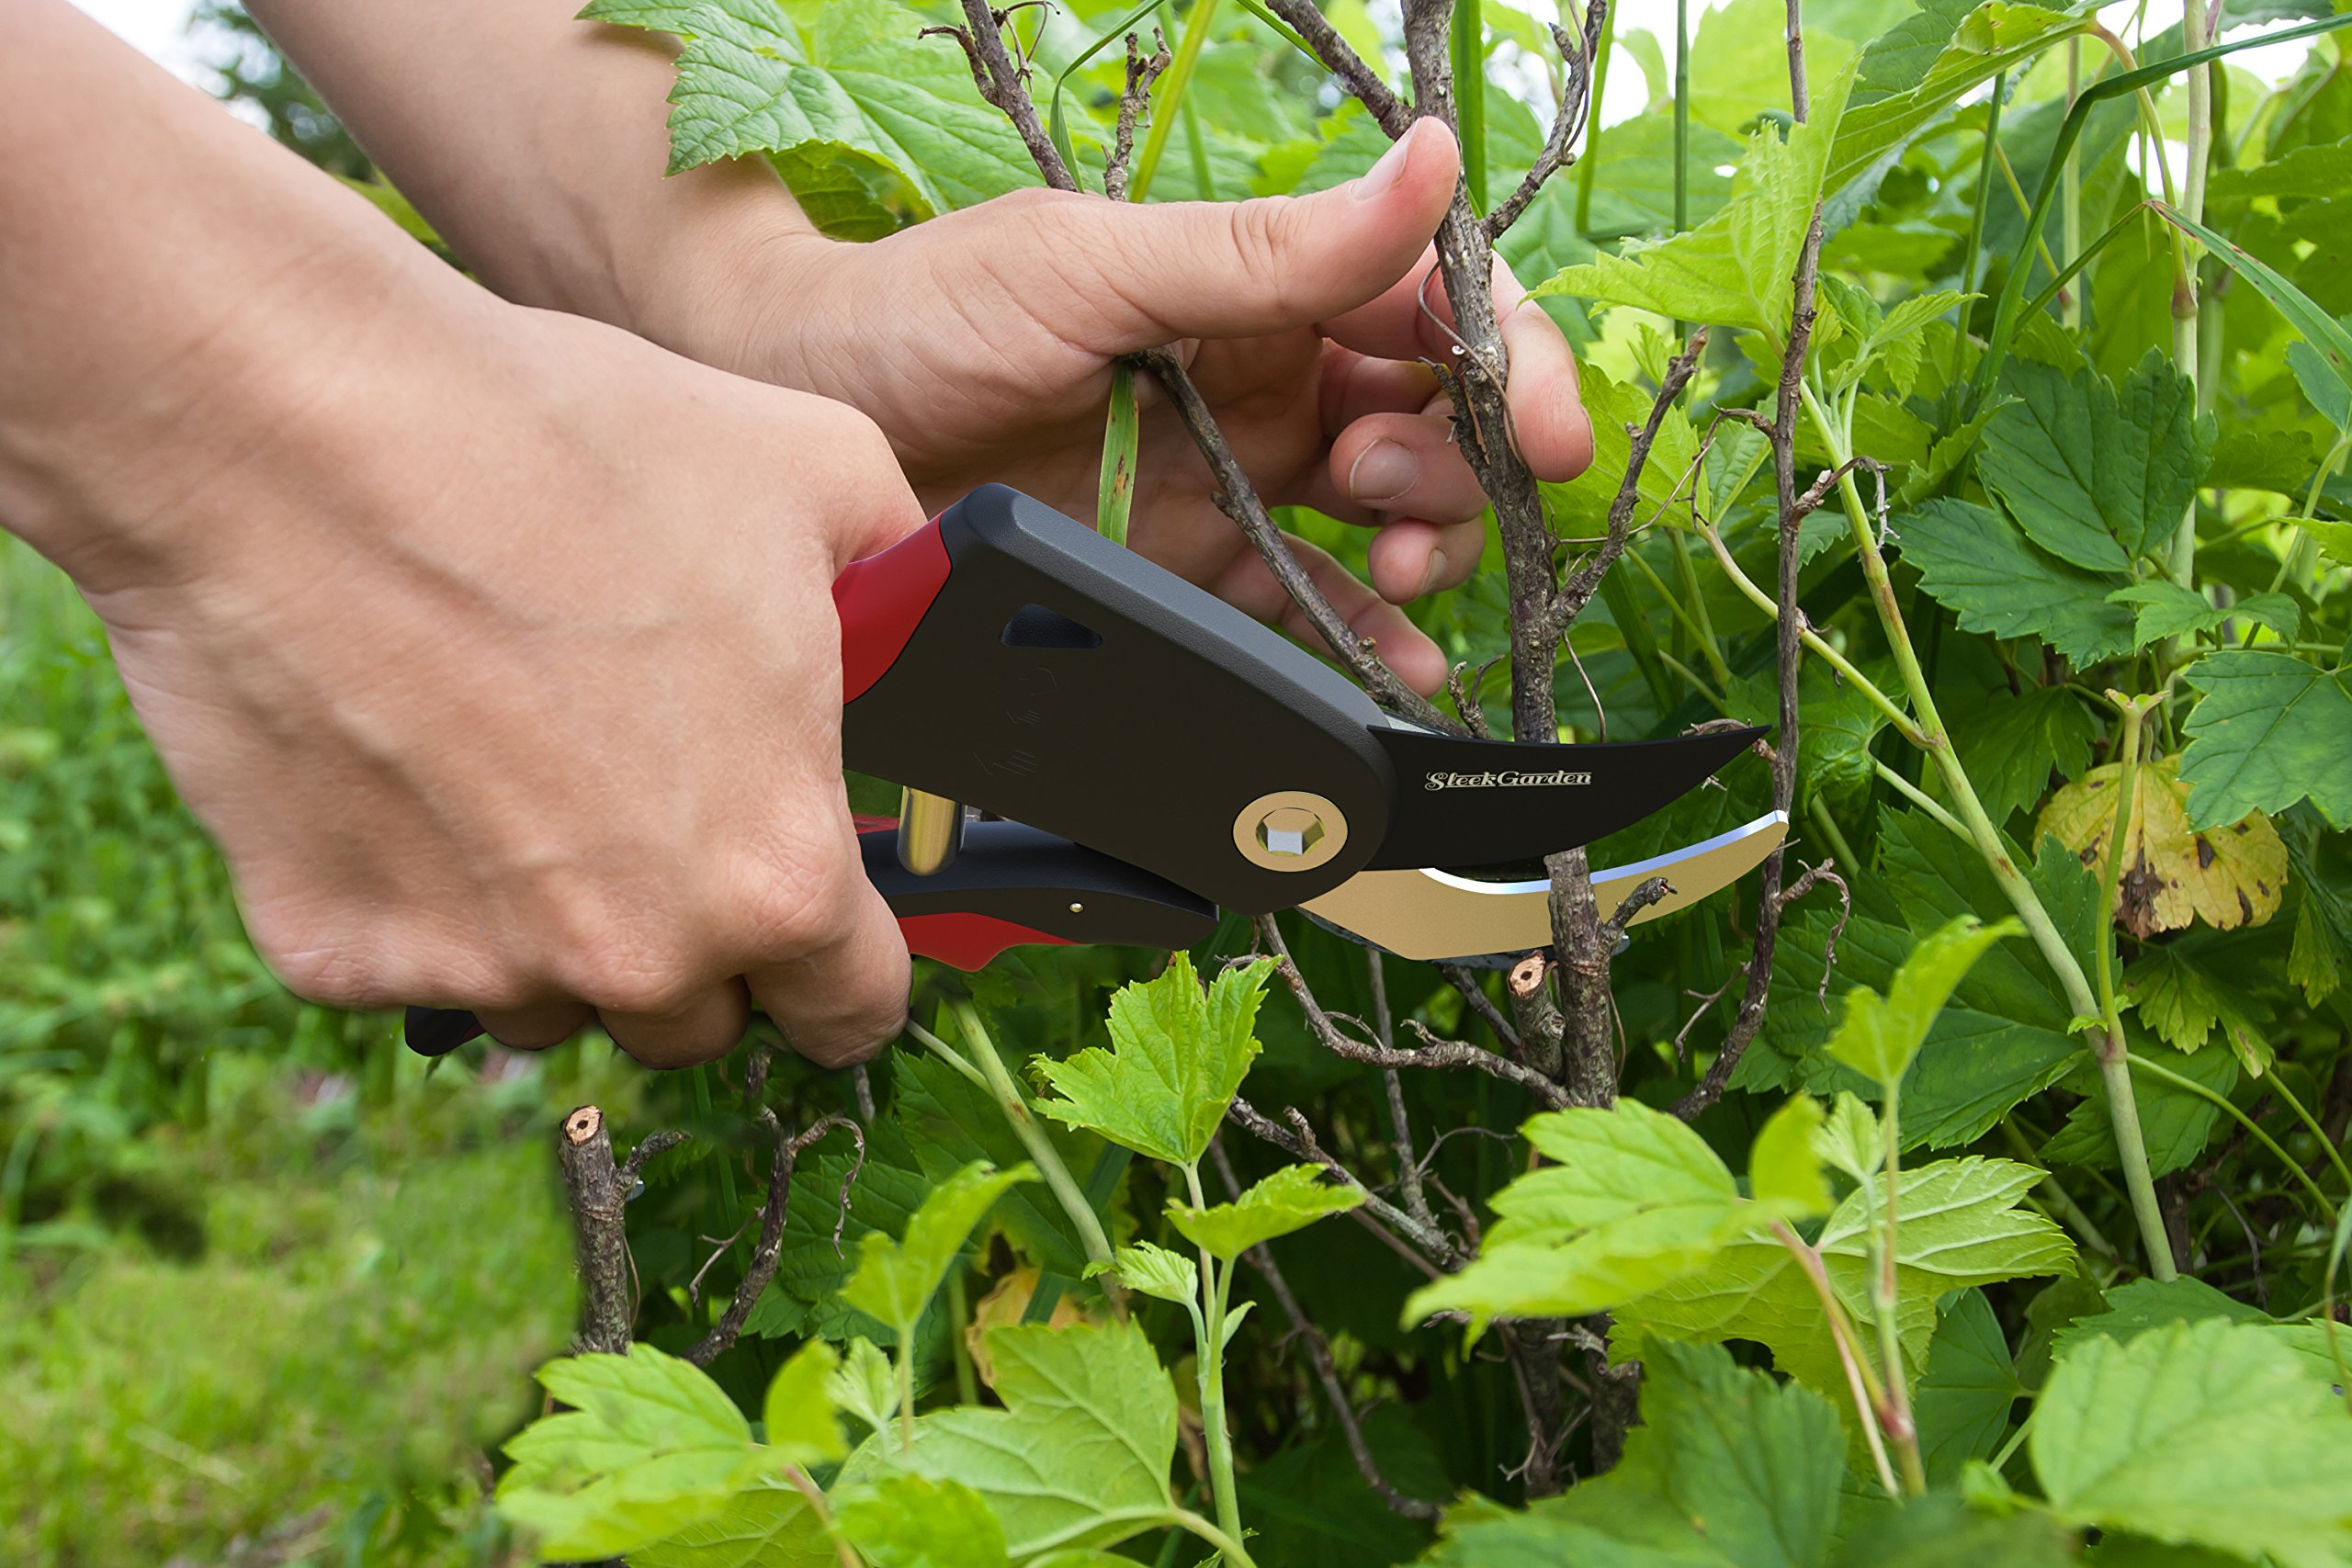 Comfort Plus 7-Piece Gardening Tool Set - Includes EZ-Cut Pruners, Lightweight Aluminum Tools with Soft Rubber Handles and Ergonomic Garden Tote and High Density Comfort Knee Pads by Sleek Garden (Image #7)